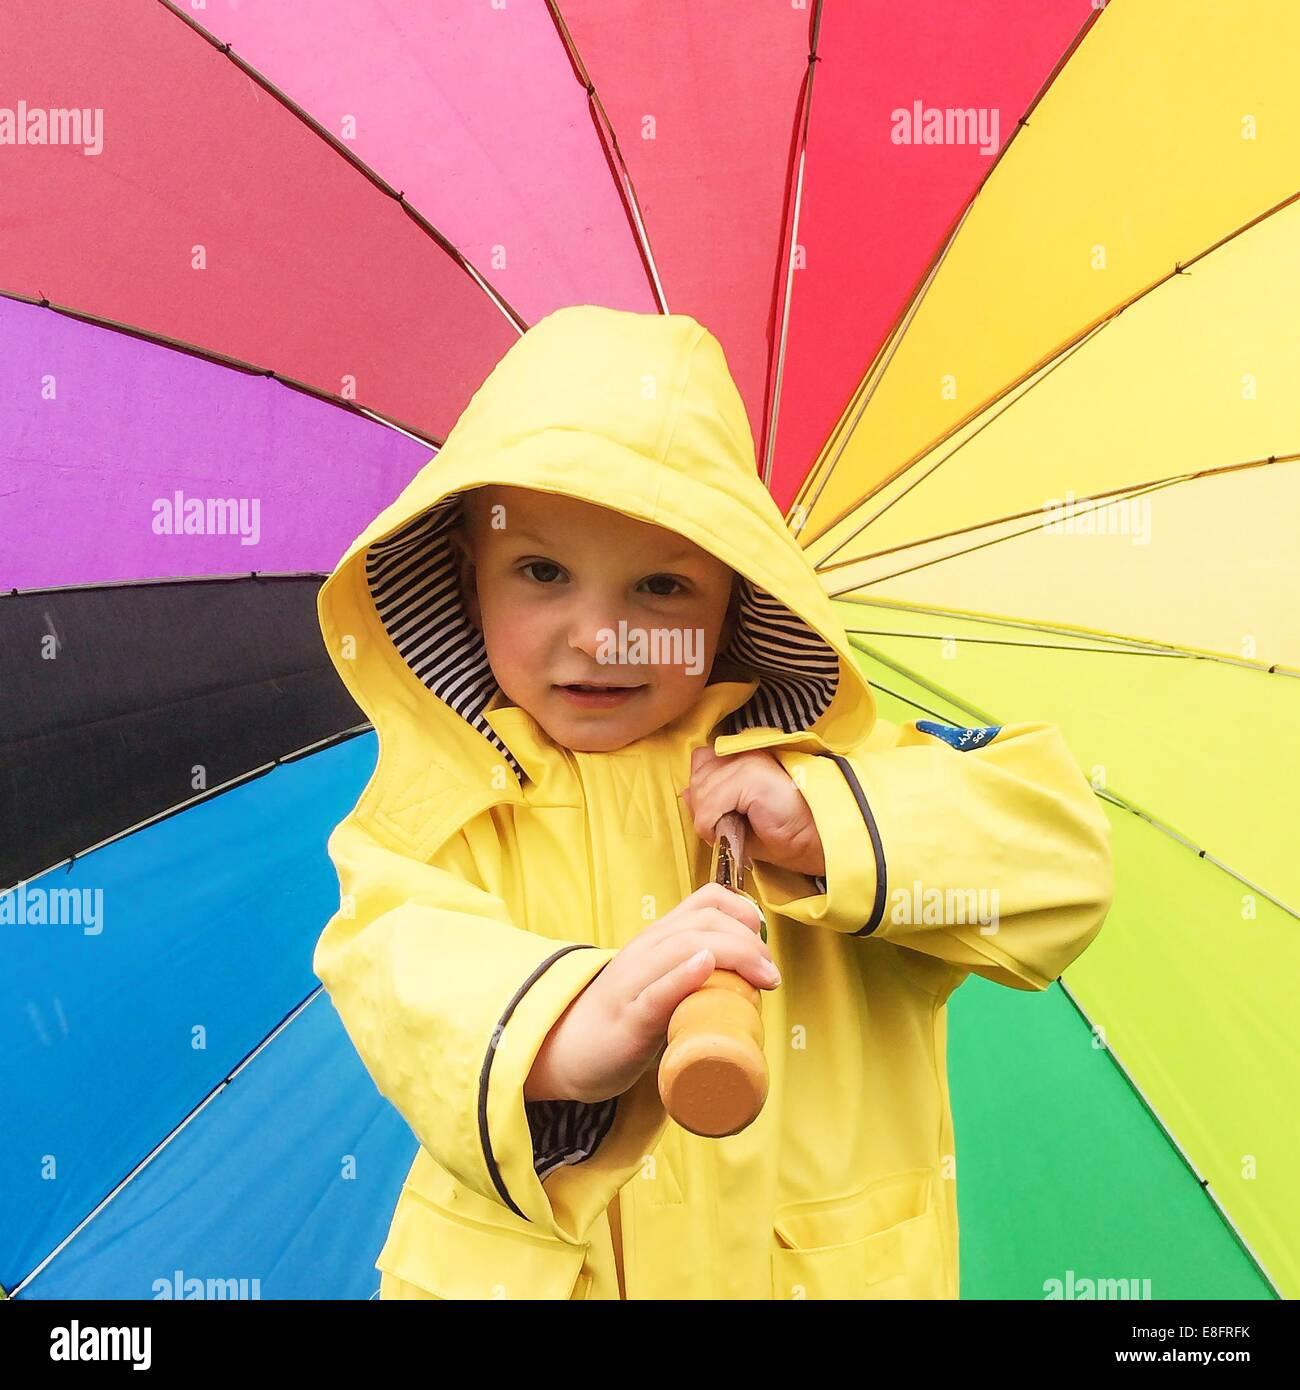 Boy in a raincoat holding a multi-colored umbrella - Stock Image